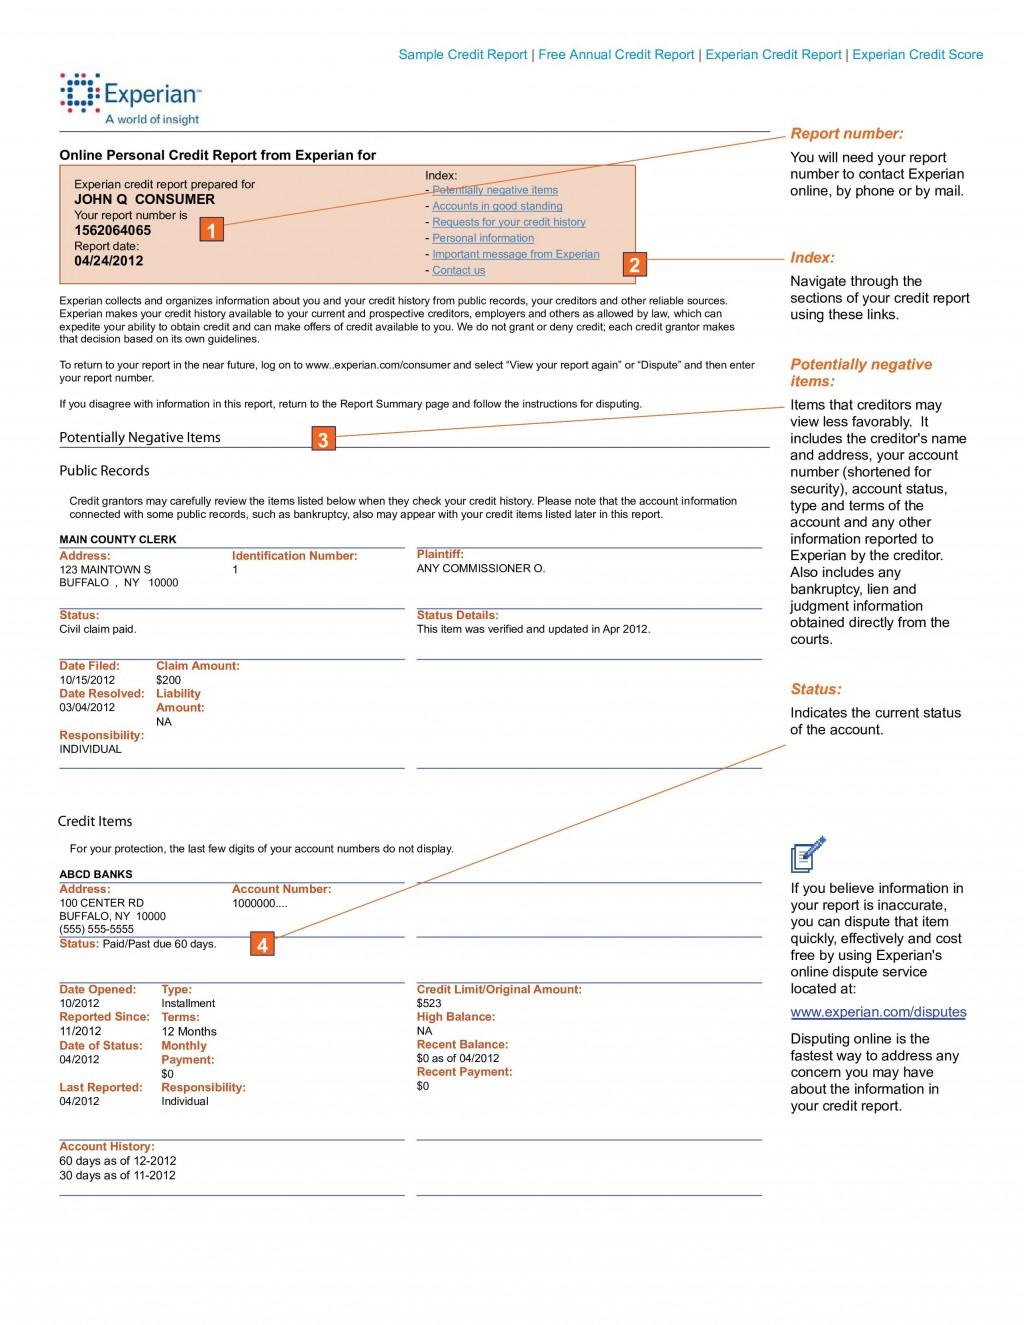 000 Awful Fake Credit Report Template Image  Karma EquifaxLarge